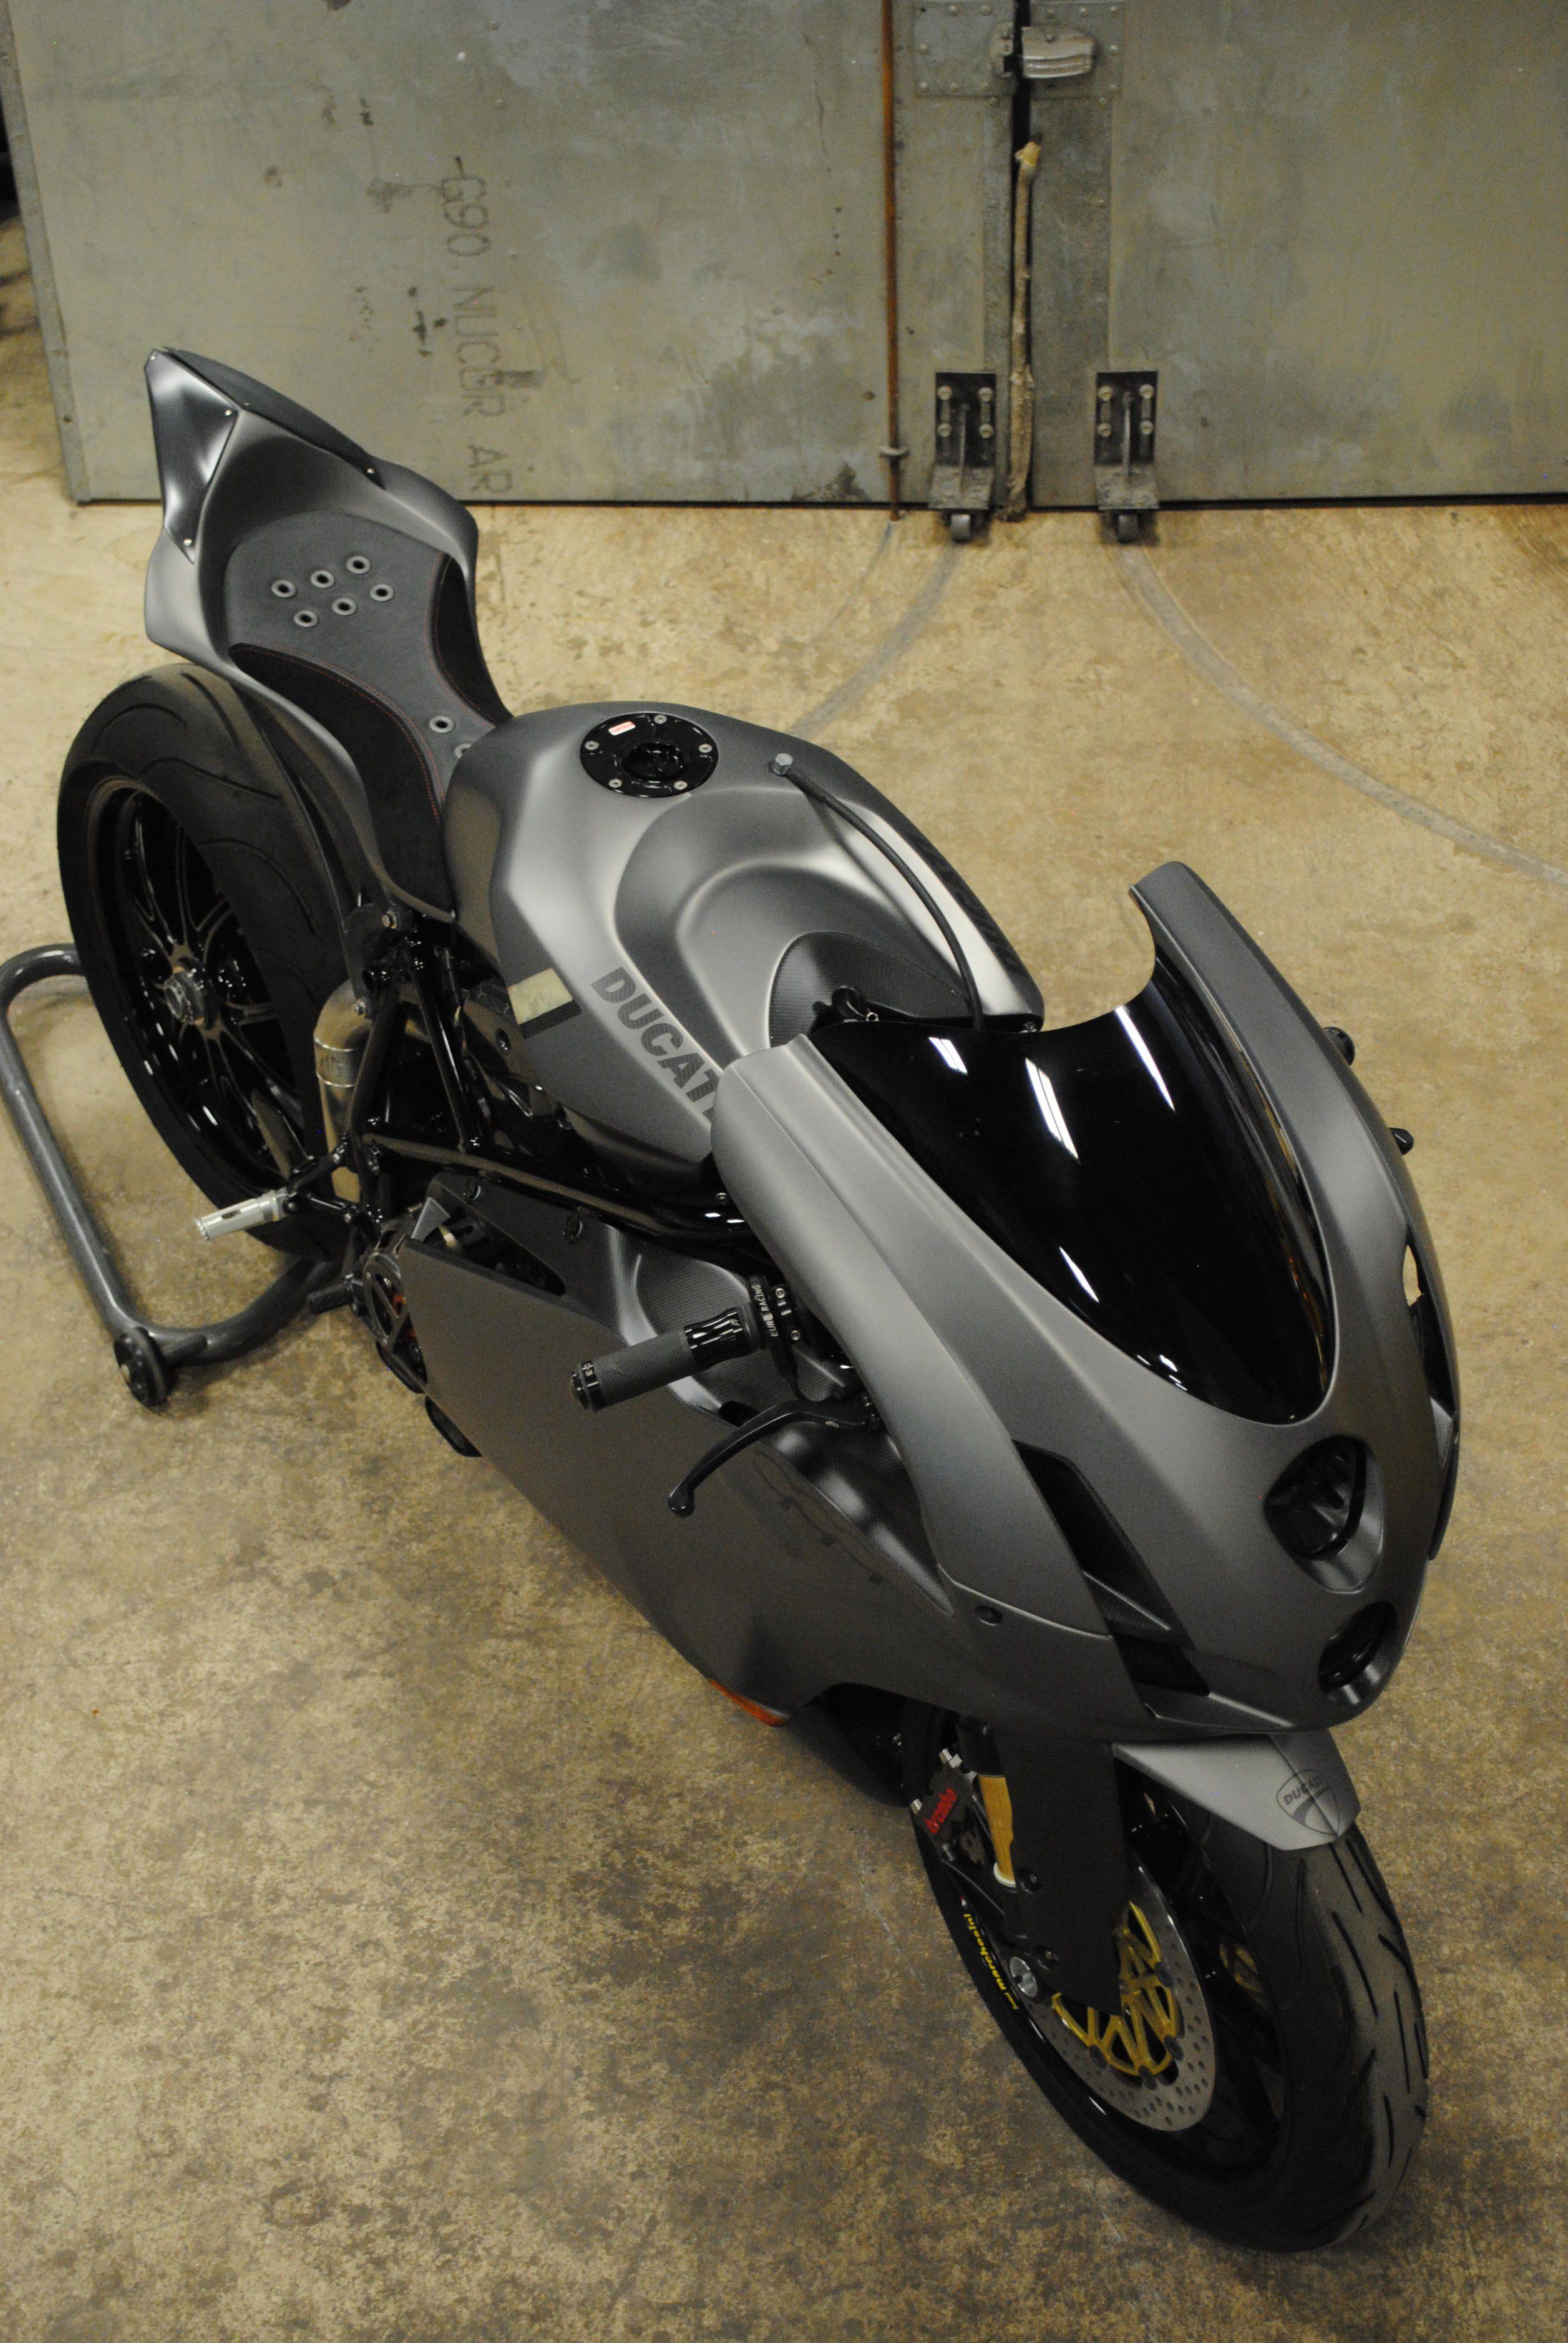 image click to enlarge motorcycles motorcycle motorbikes moto bike. Black Bedroom Furniture Sets. Home Design Ideas